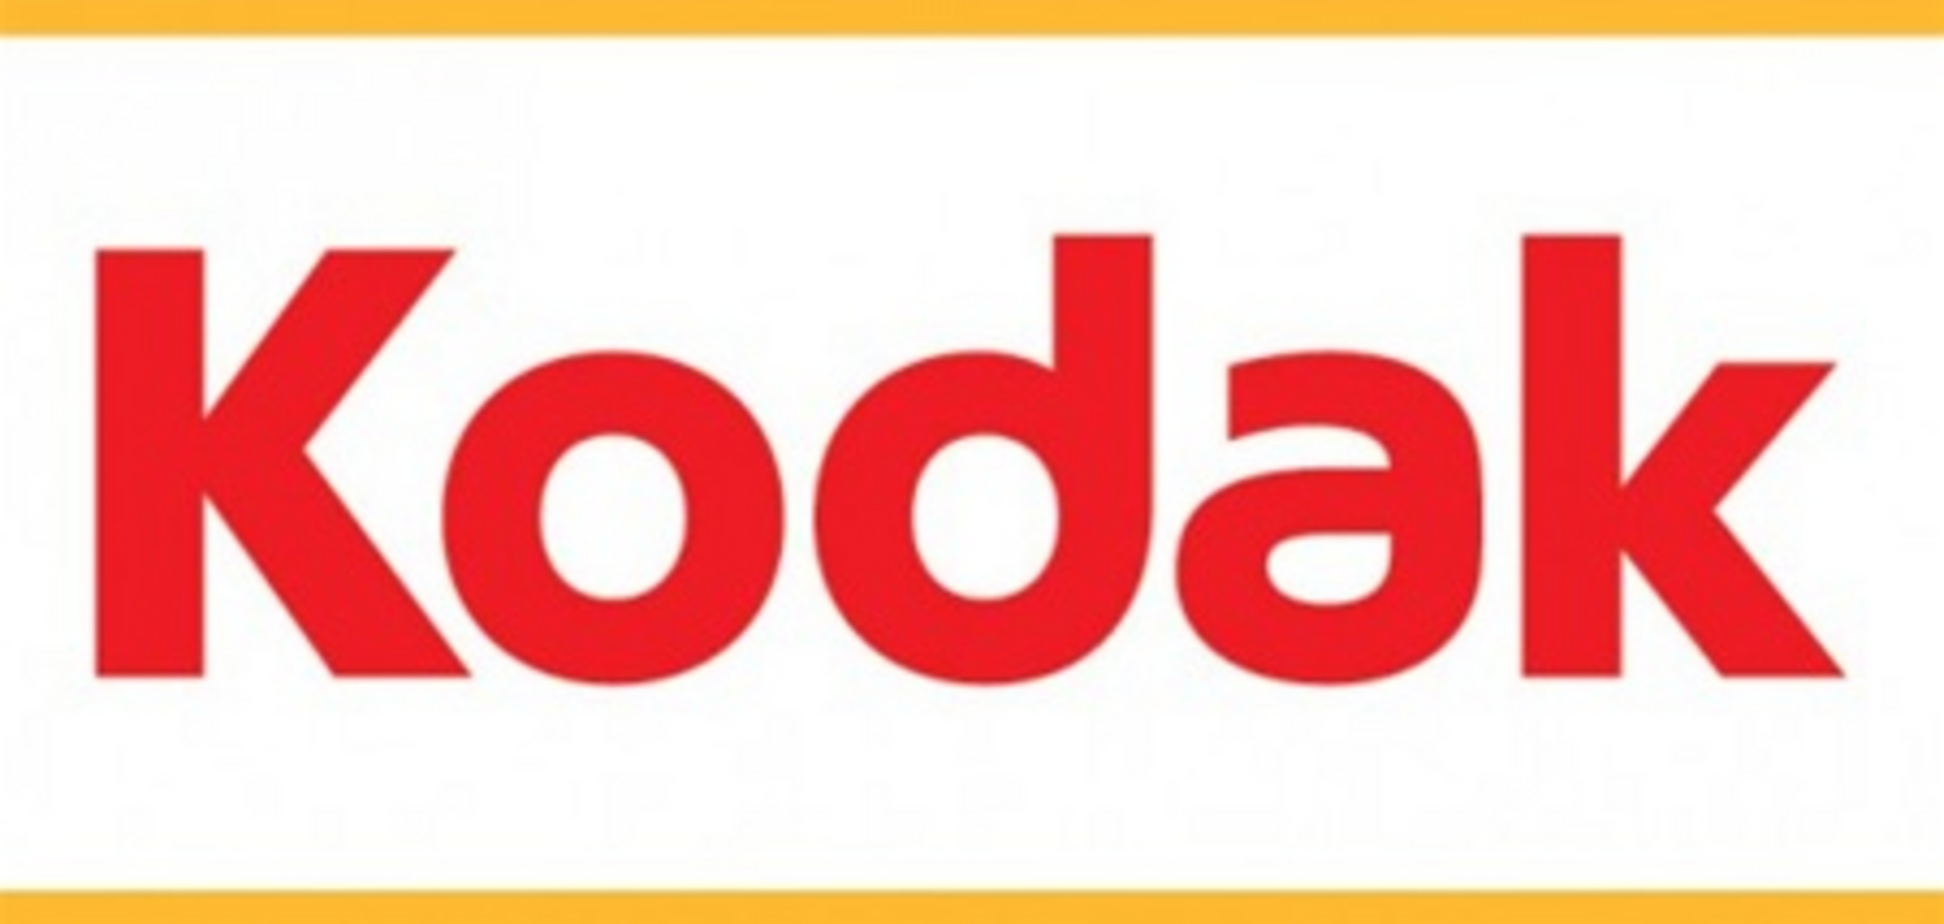 Компания Kodak подала в суд на Apple и HTC